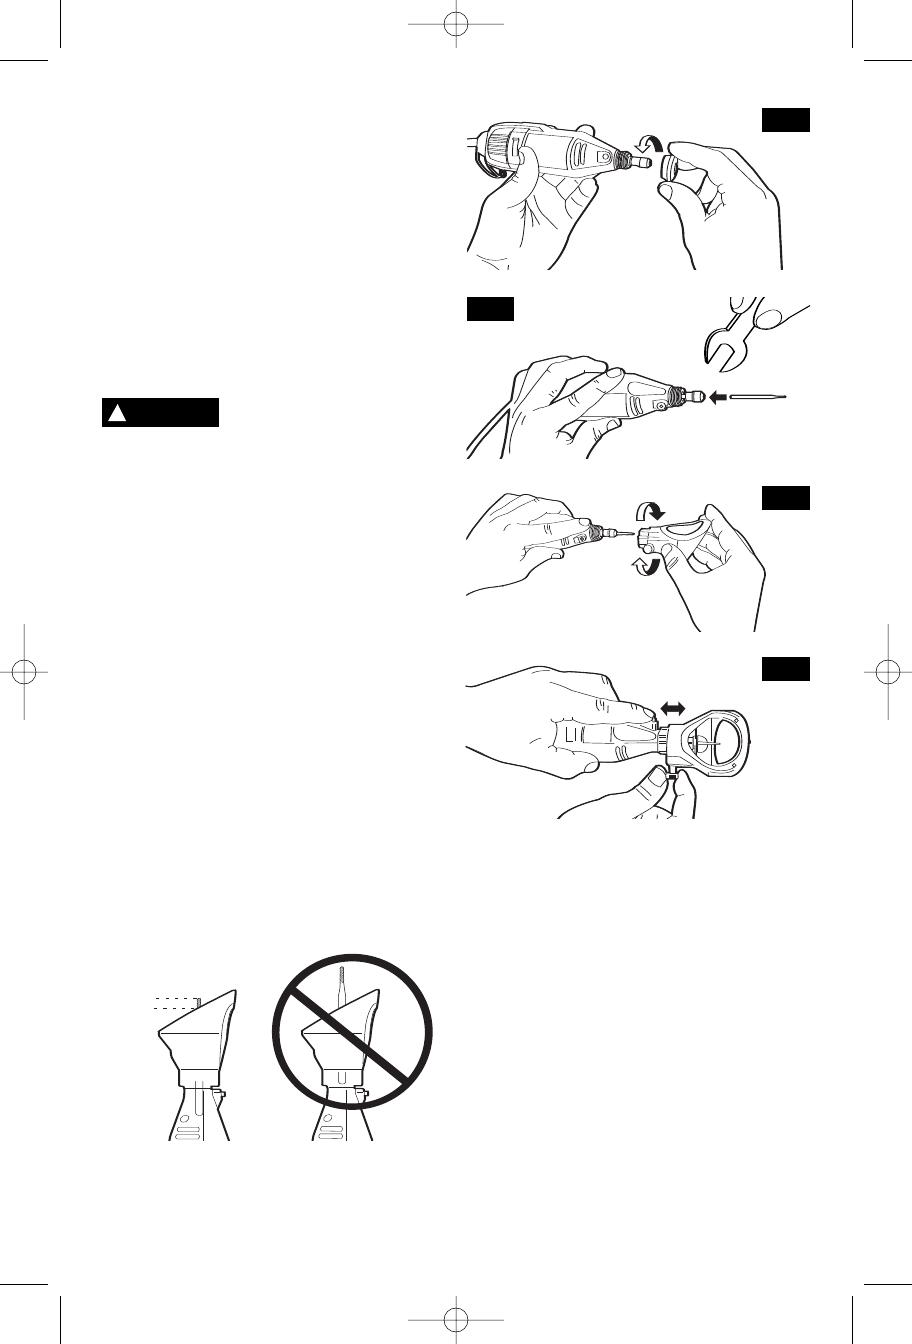 Handleiding Dremel 395t6 Pagina 15 Van 92 English Espanl Franais Wiring Diagram